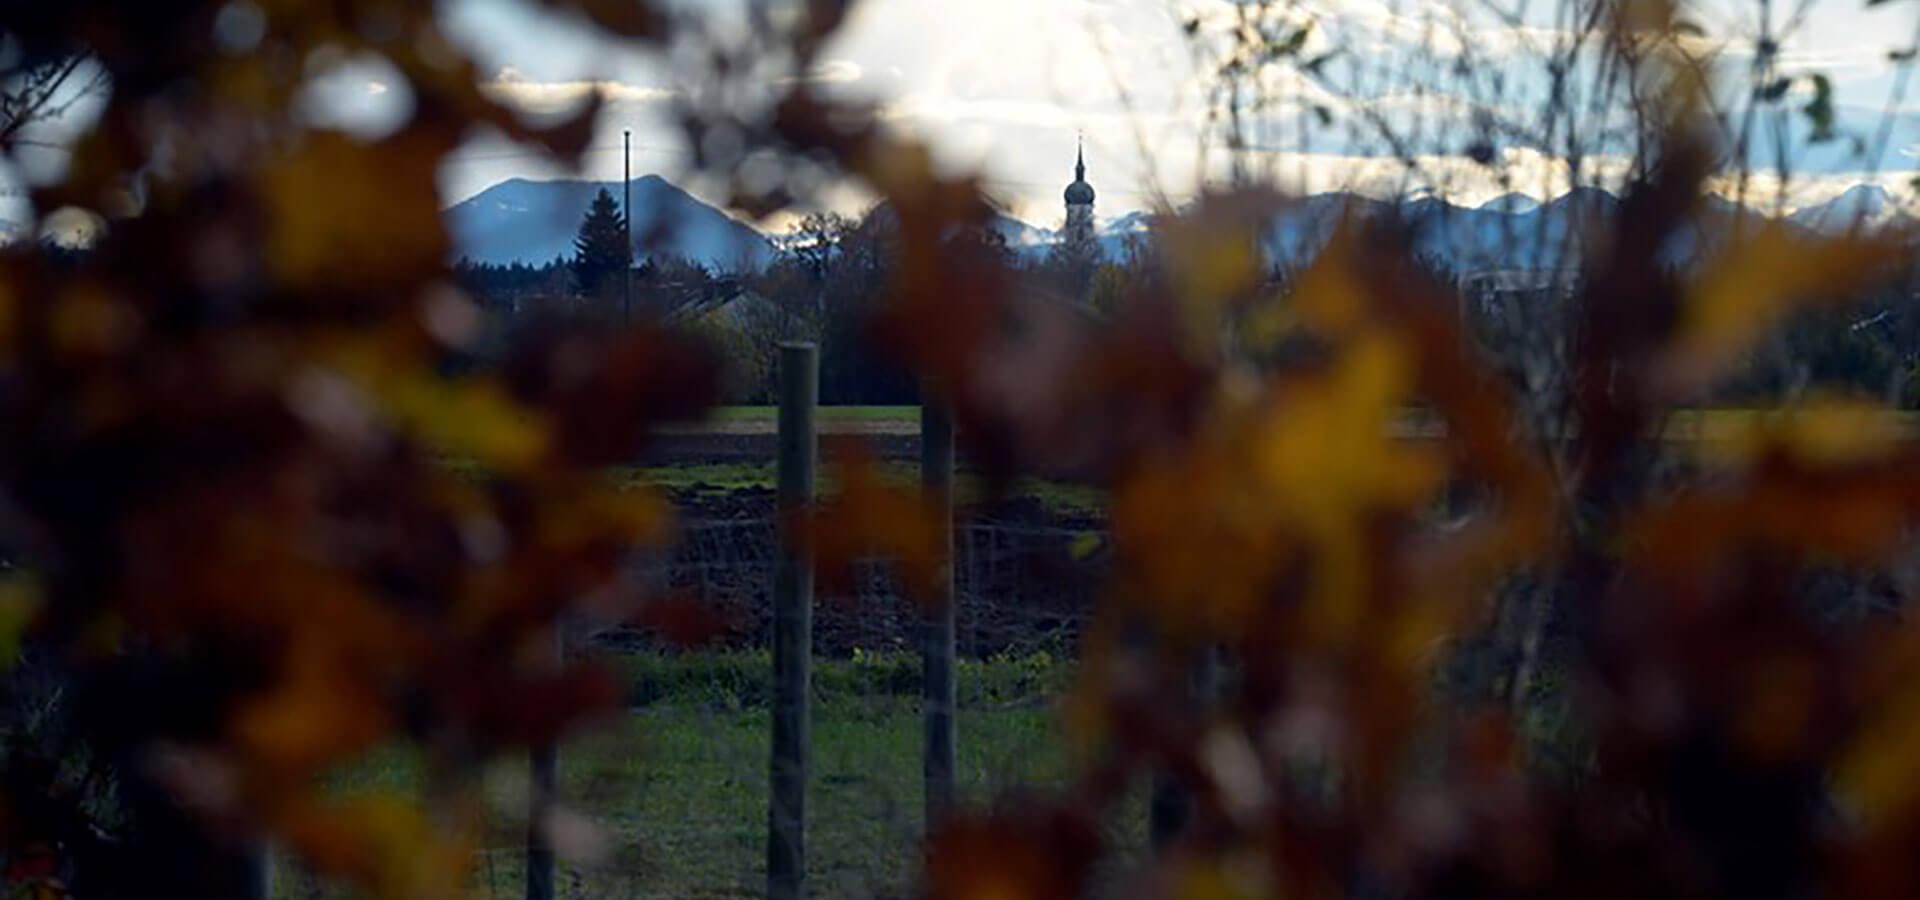 Höhenkirchen-Siegertsbrunn im Herbst